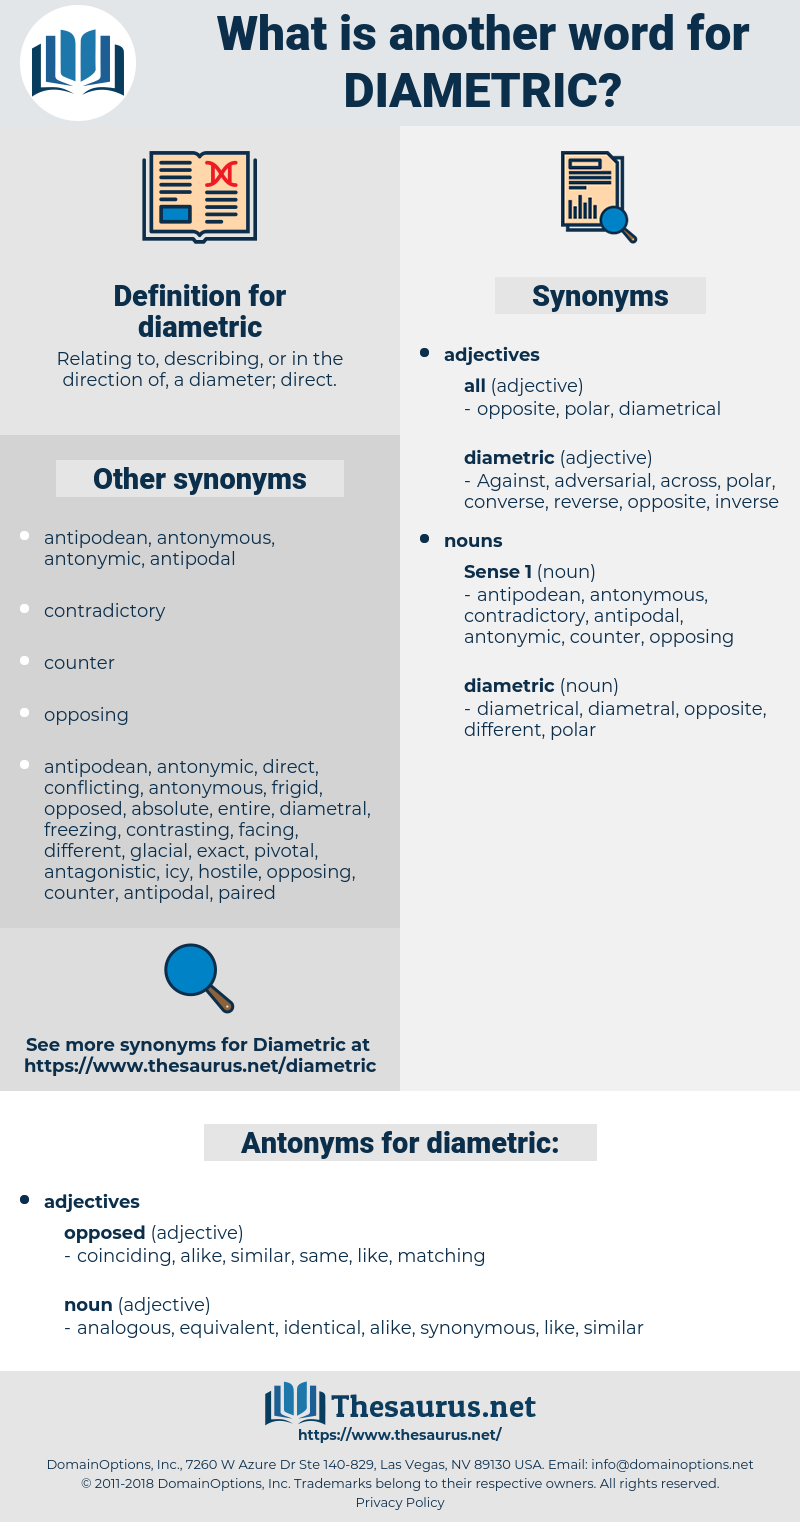 diametric, synonym diametric, another word for diametric, words like diametric, thesaurus diametric